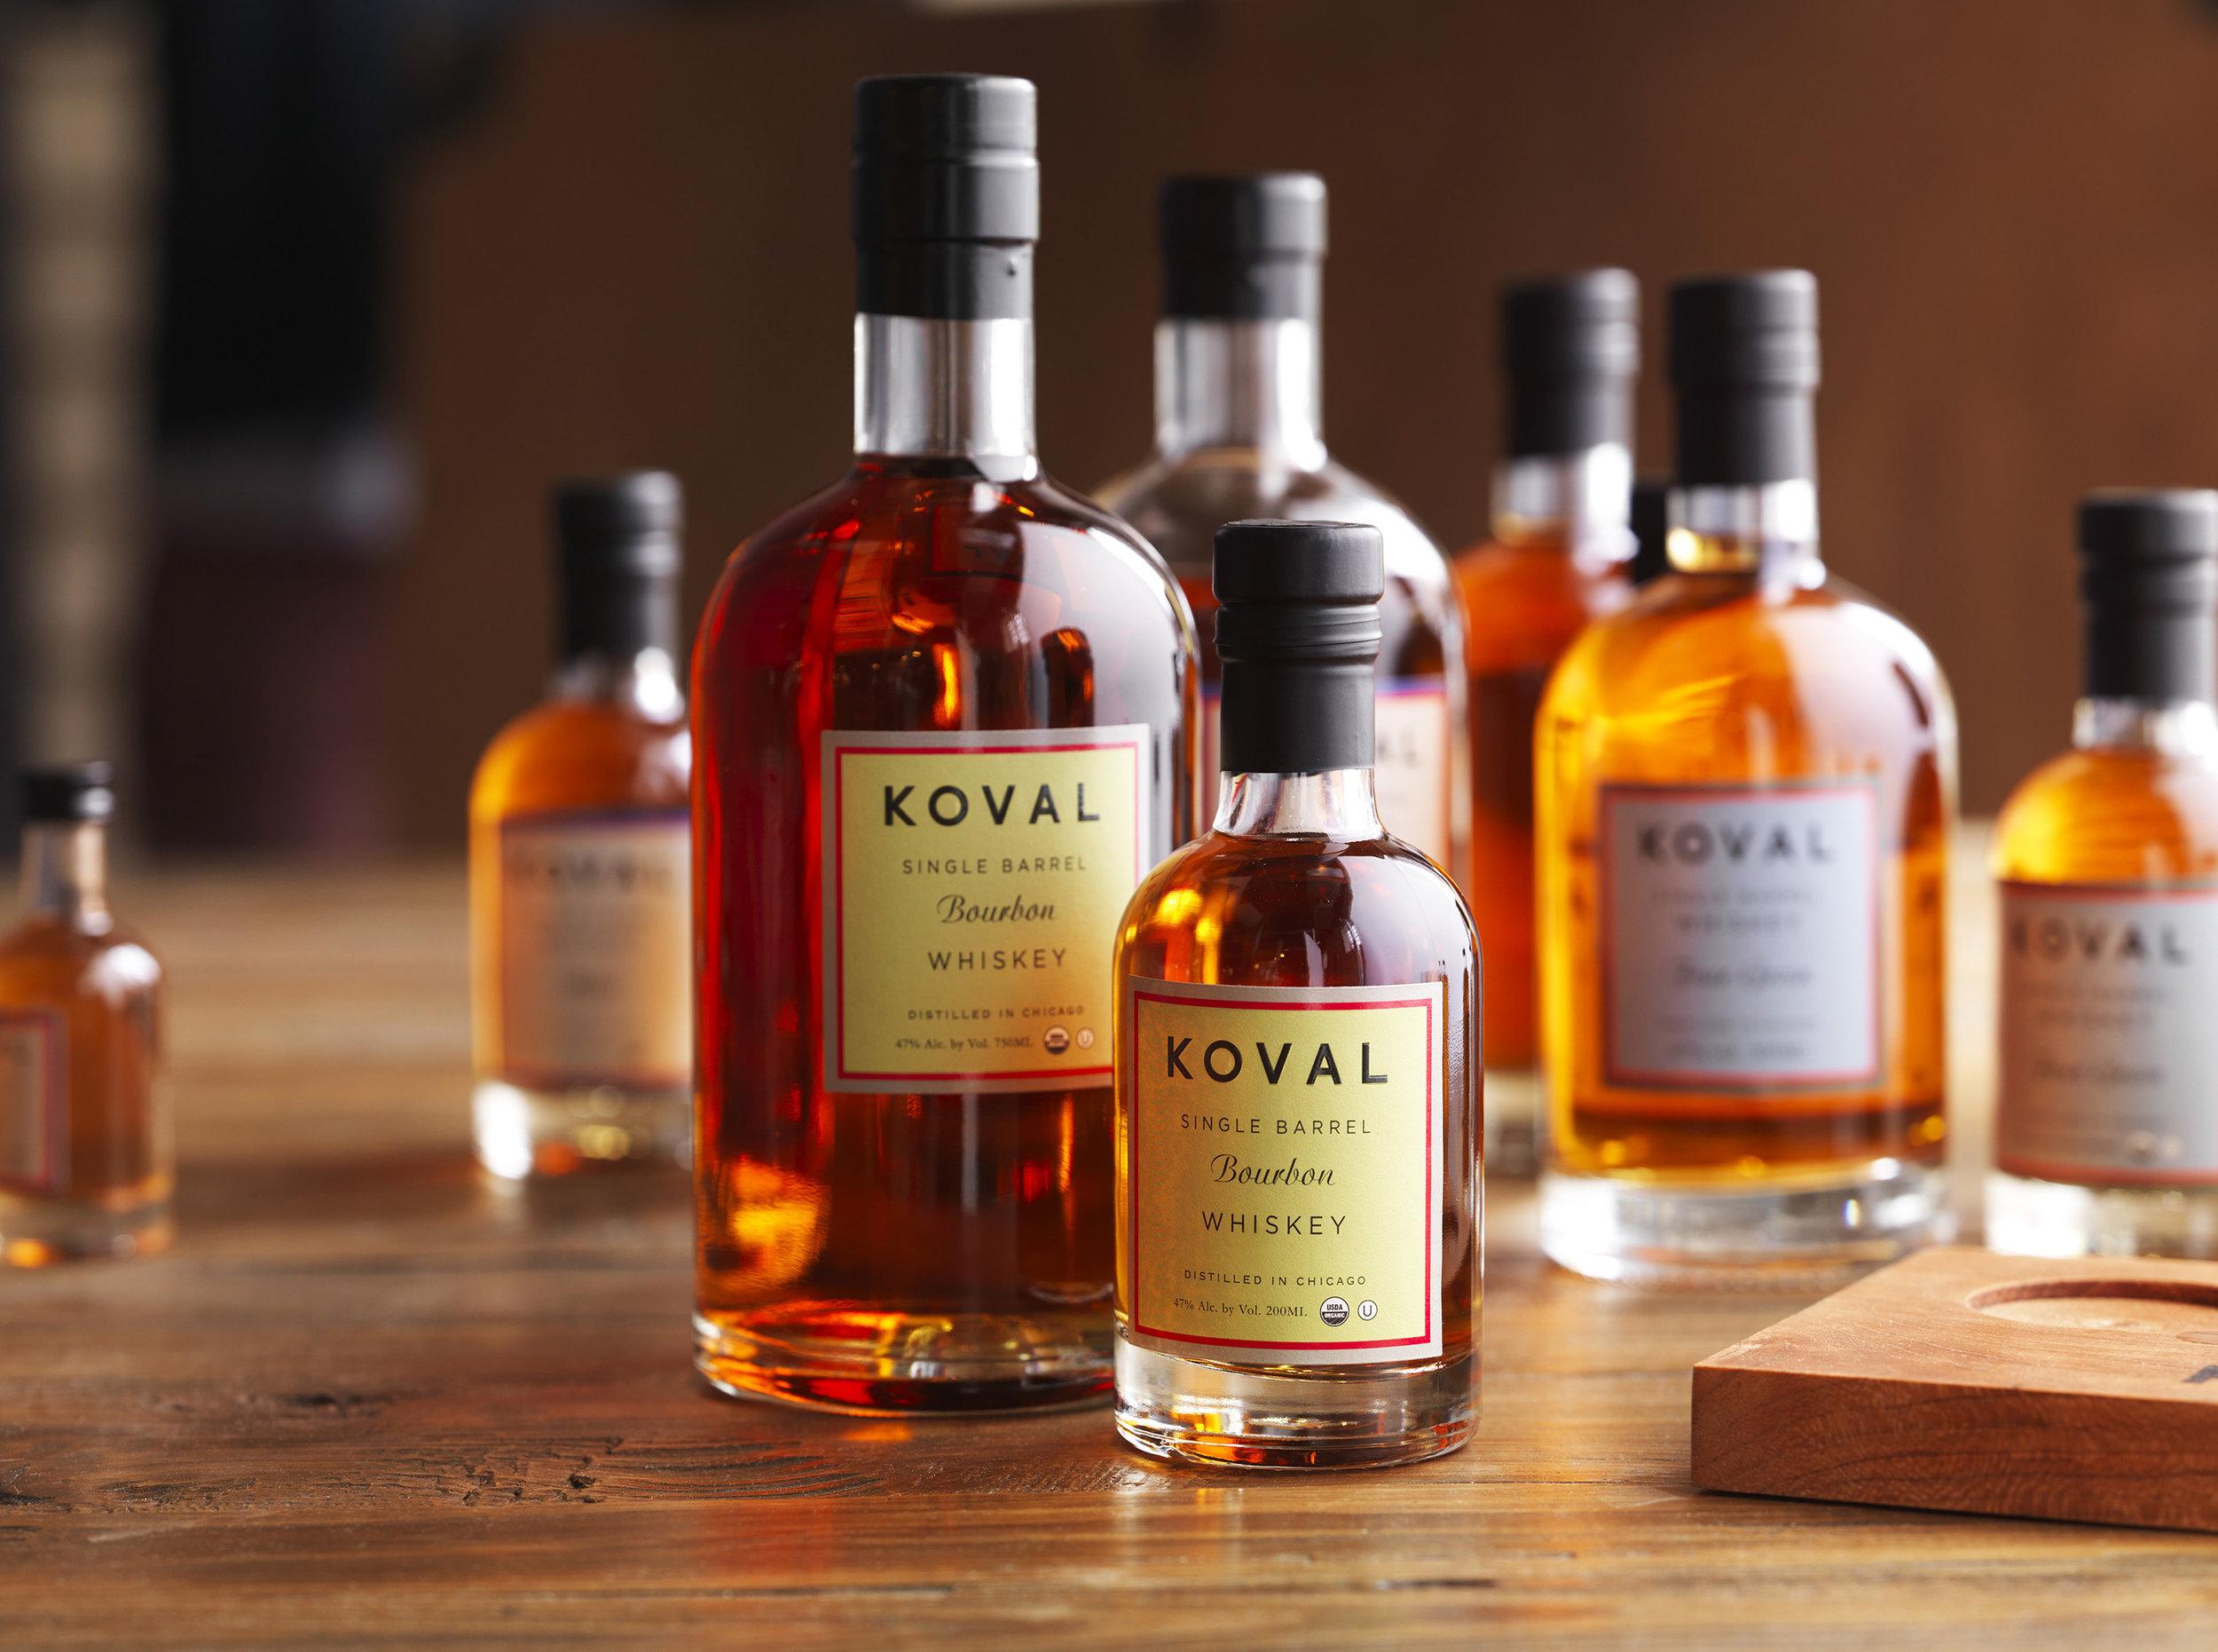 KOVAL bottle - whiskey sizes.jpg